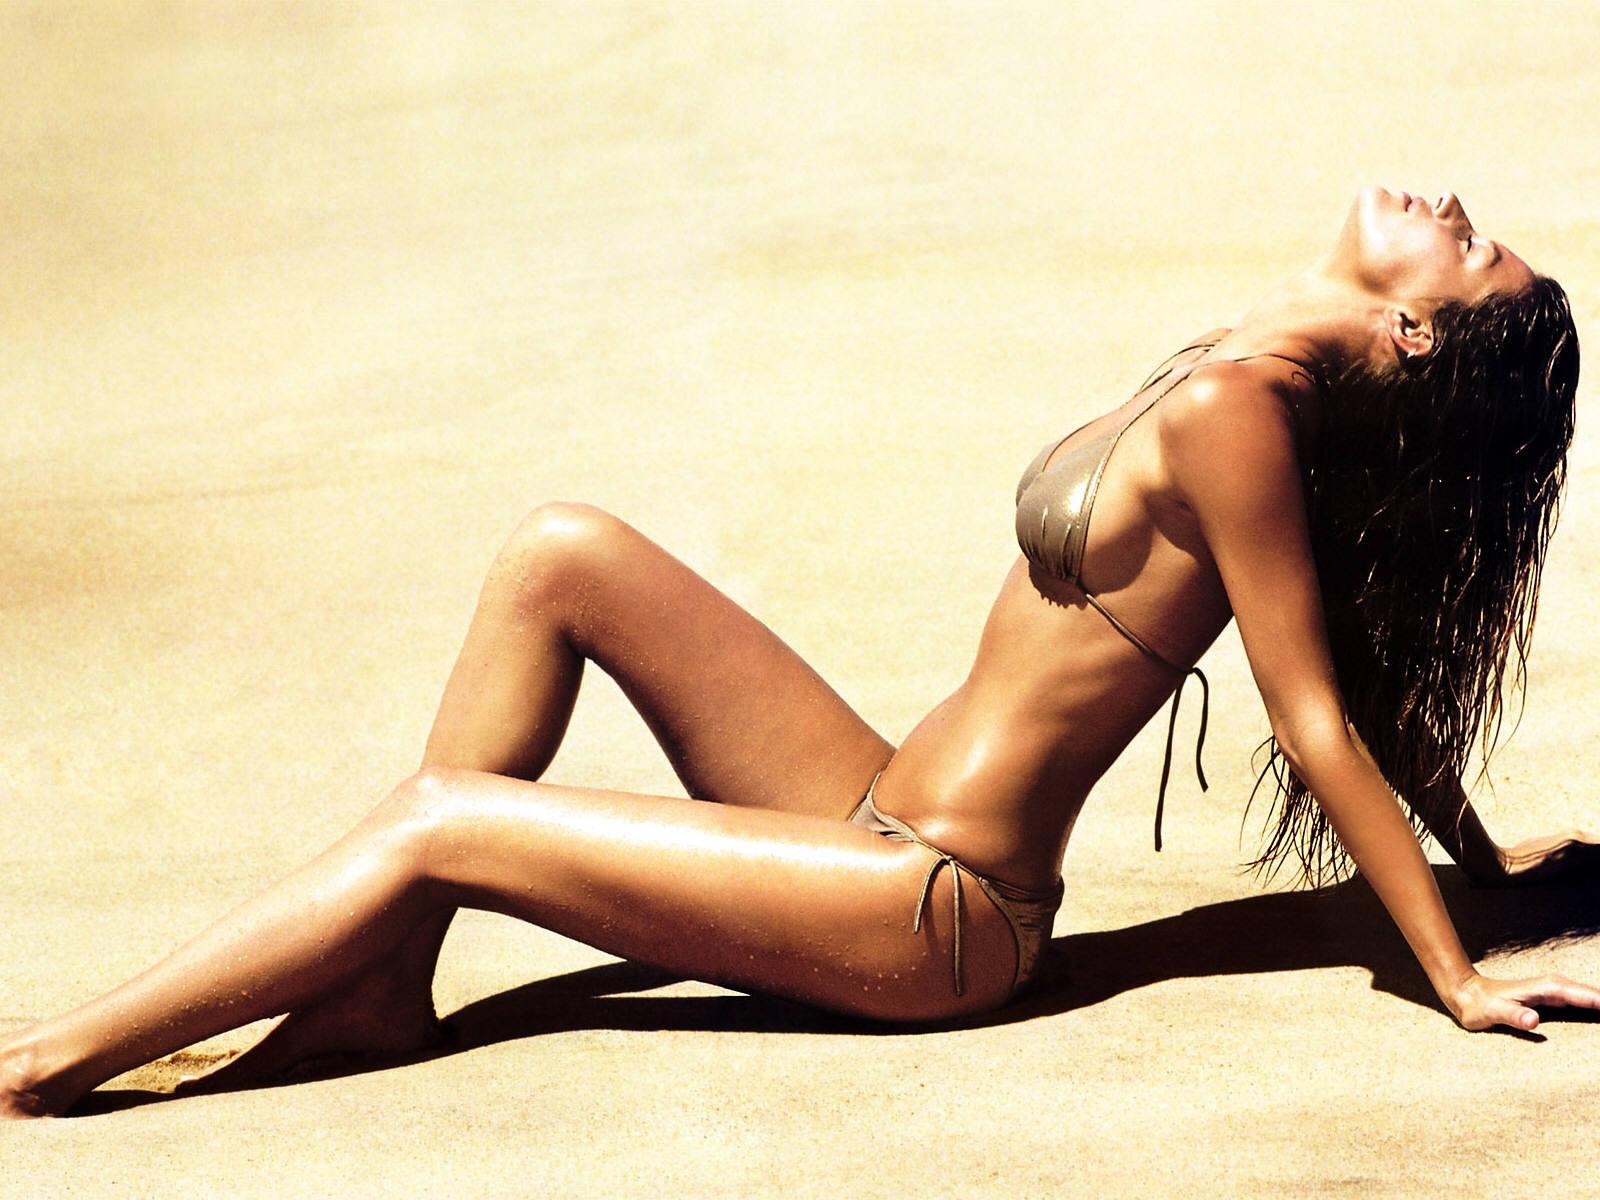 Sunny Leone Wallpapers | Sunny Leone Photos: Sunny Leone Hot in Indian ...